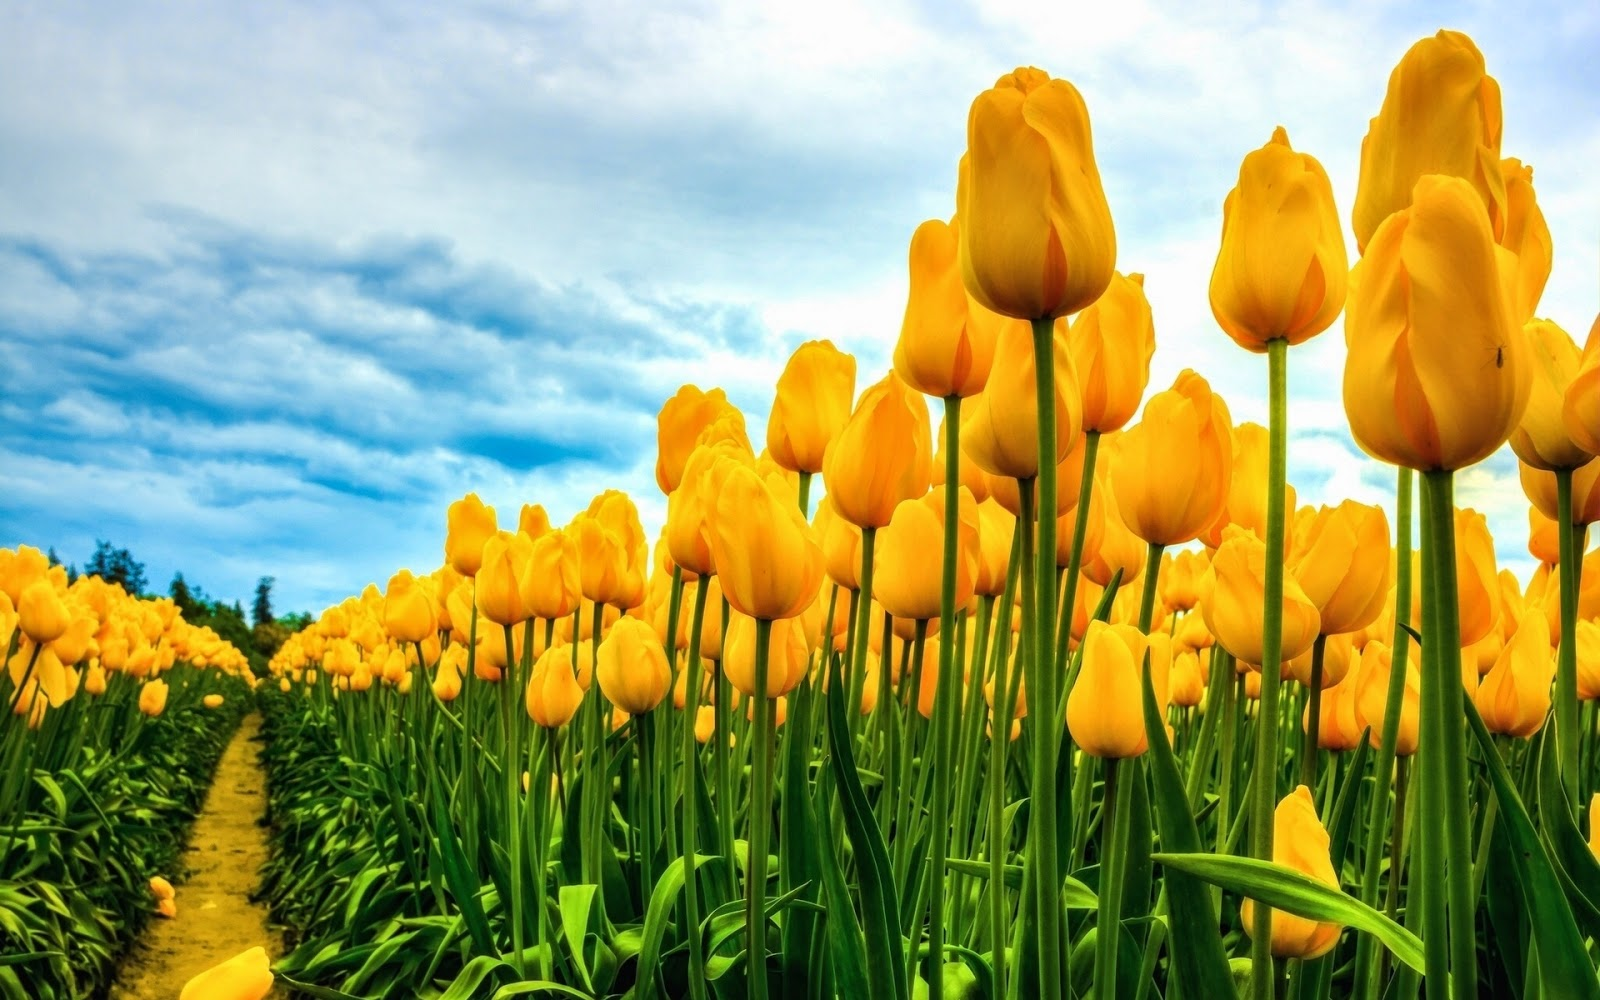 hd hintergrundbilder gelbe tulpen sch nen blumen gelbe tulpe kostenlos natur fr hling. Black Bedroom Furniture Sets. Home Design Ideas